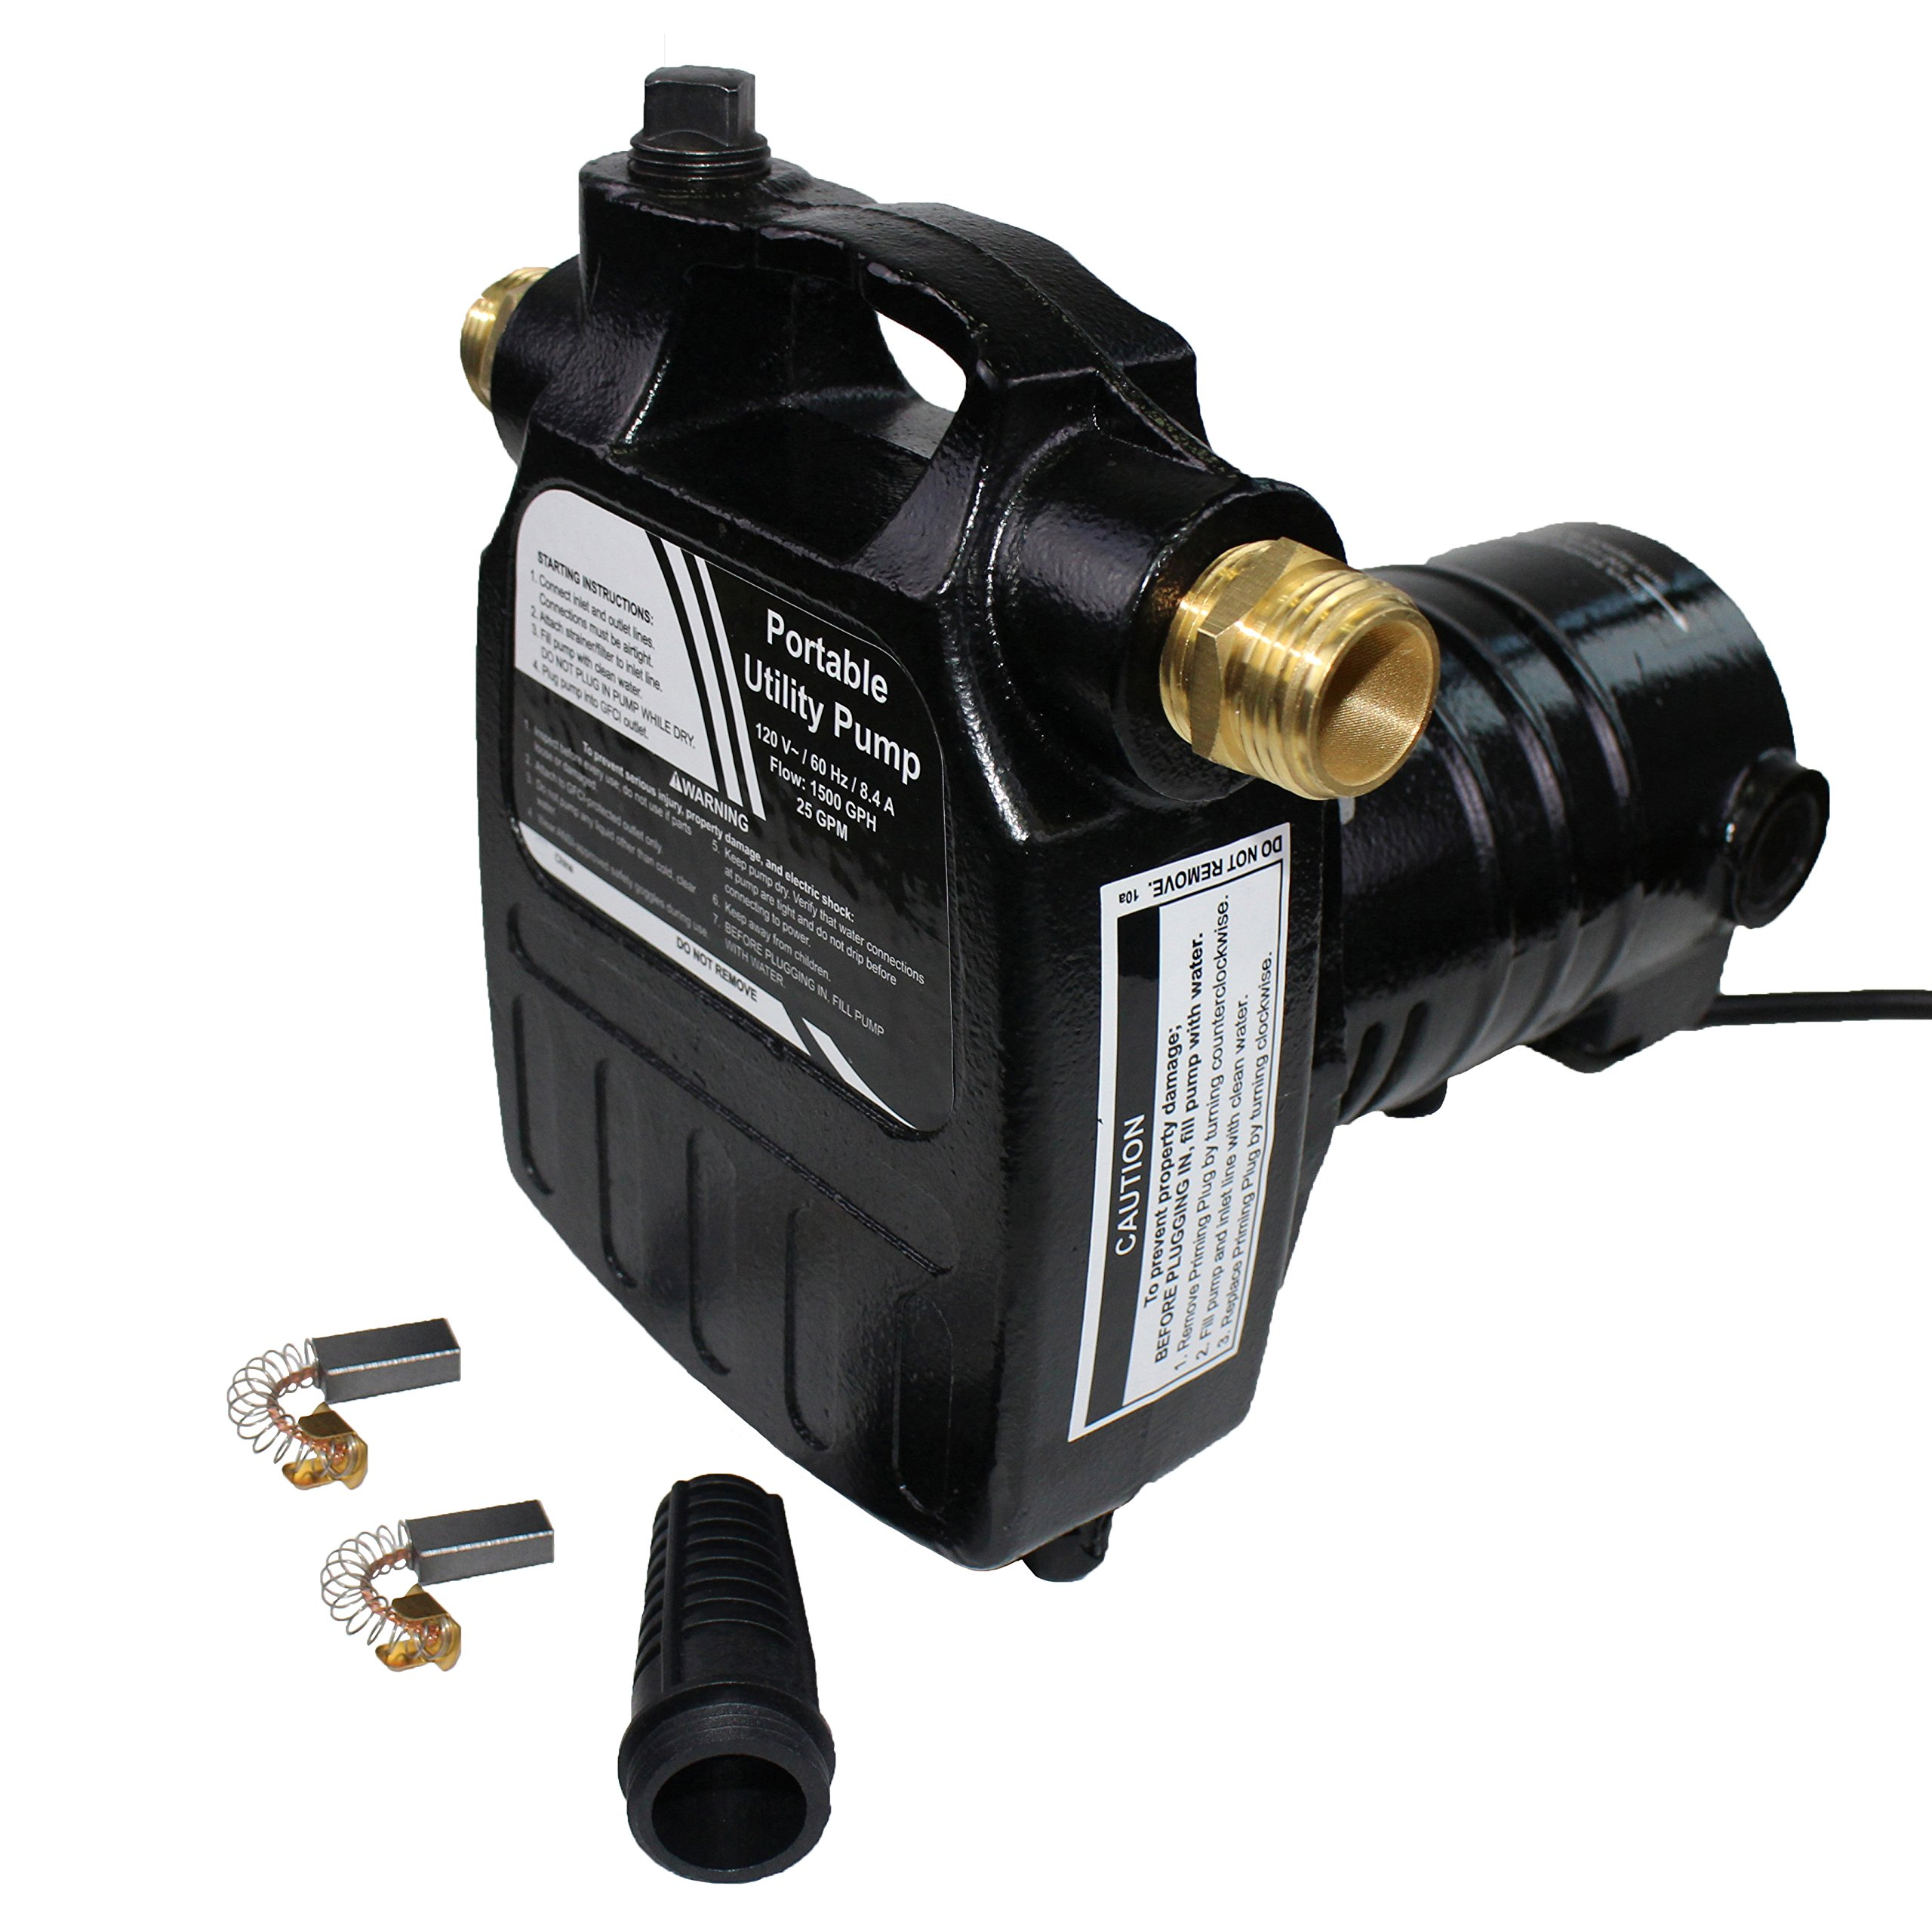 EXTRAUP 115Volt Pressure Transfer Connectors